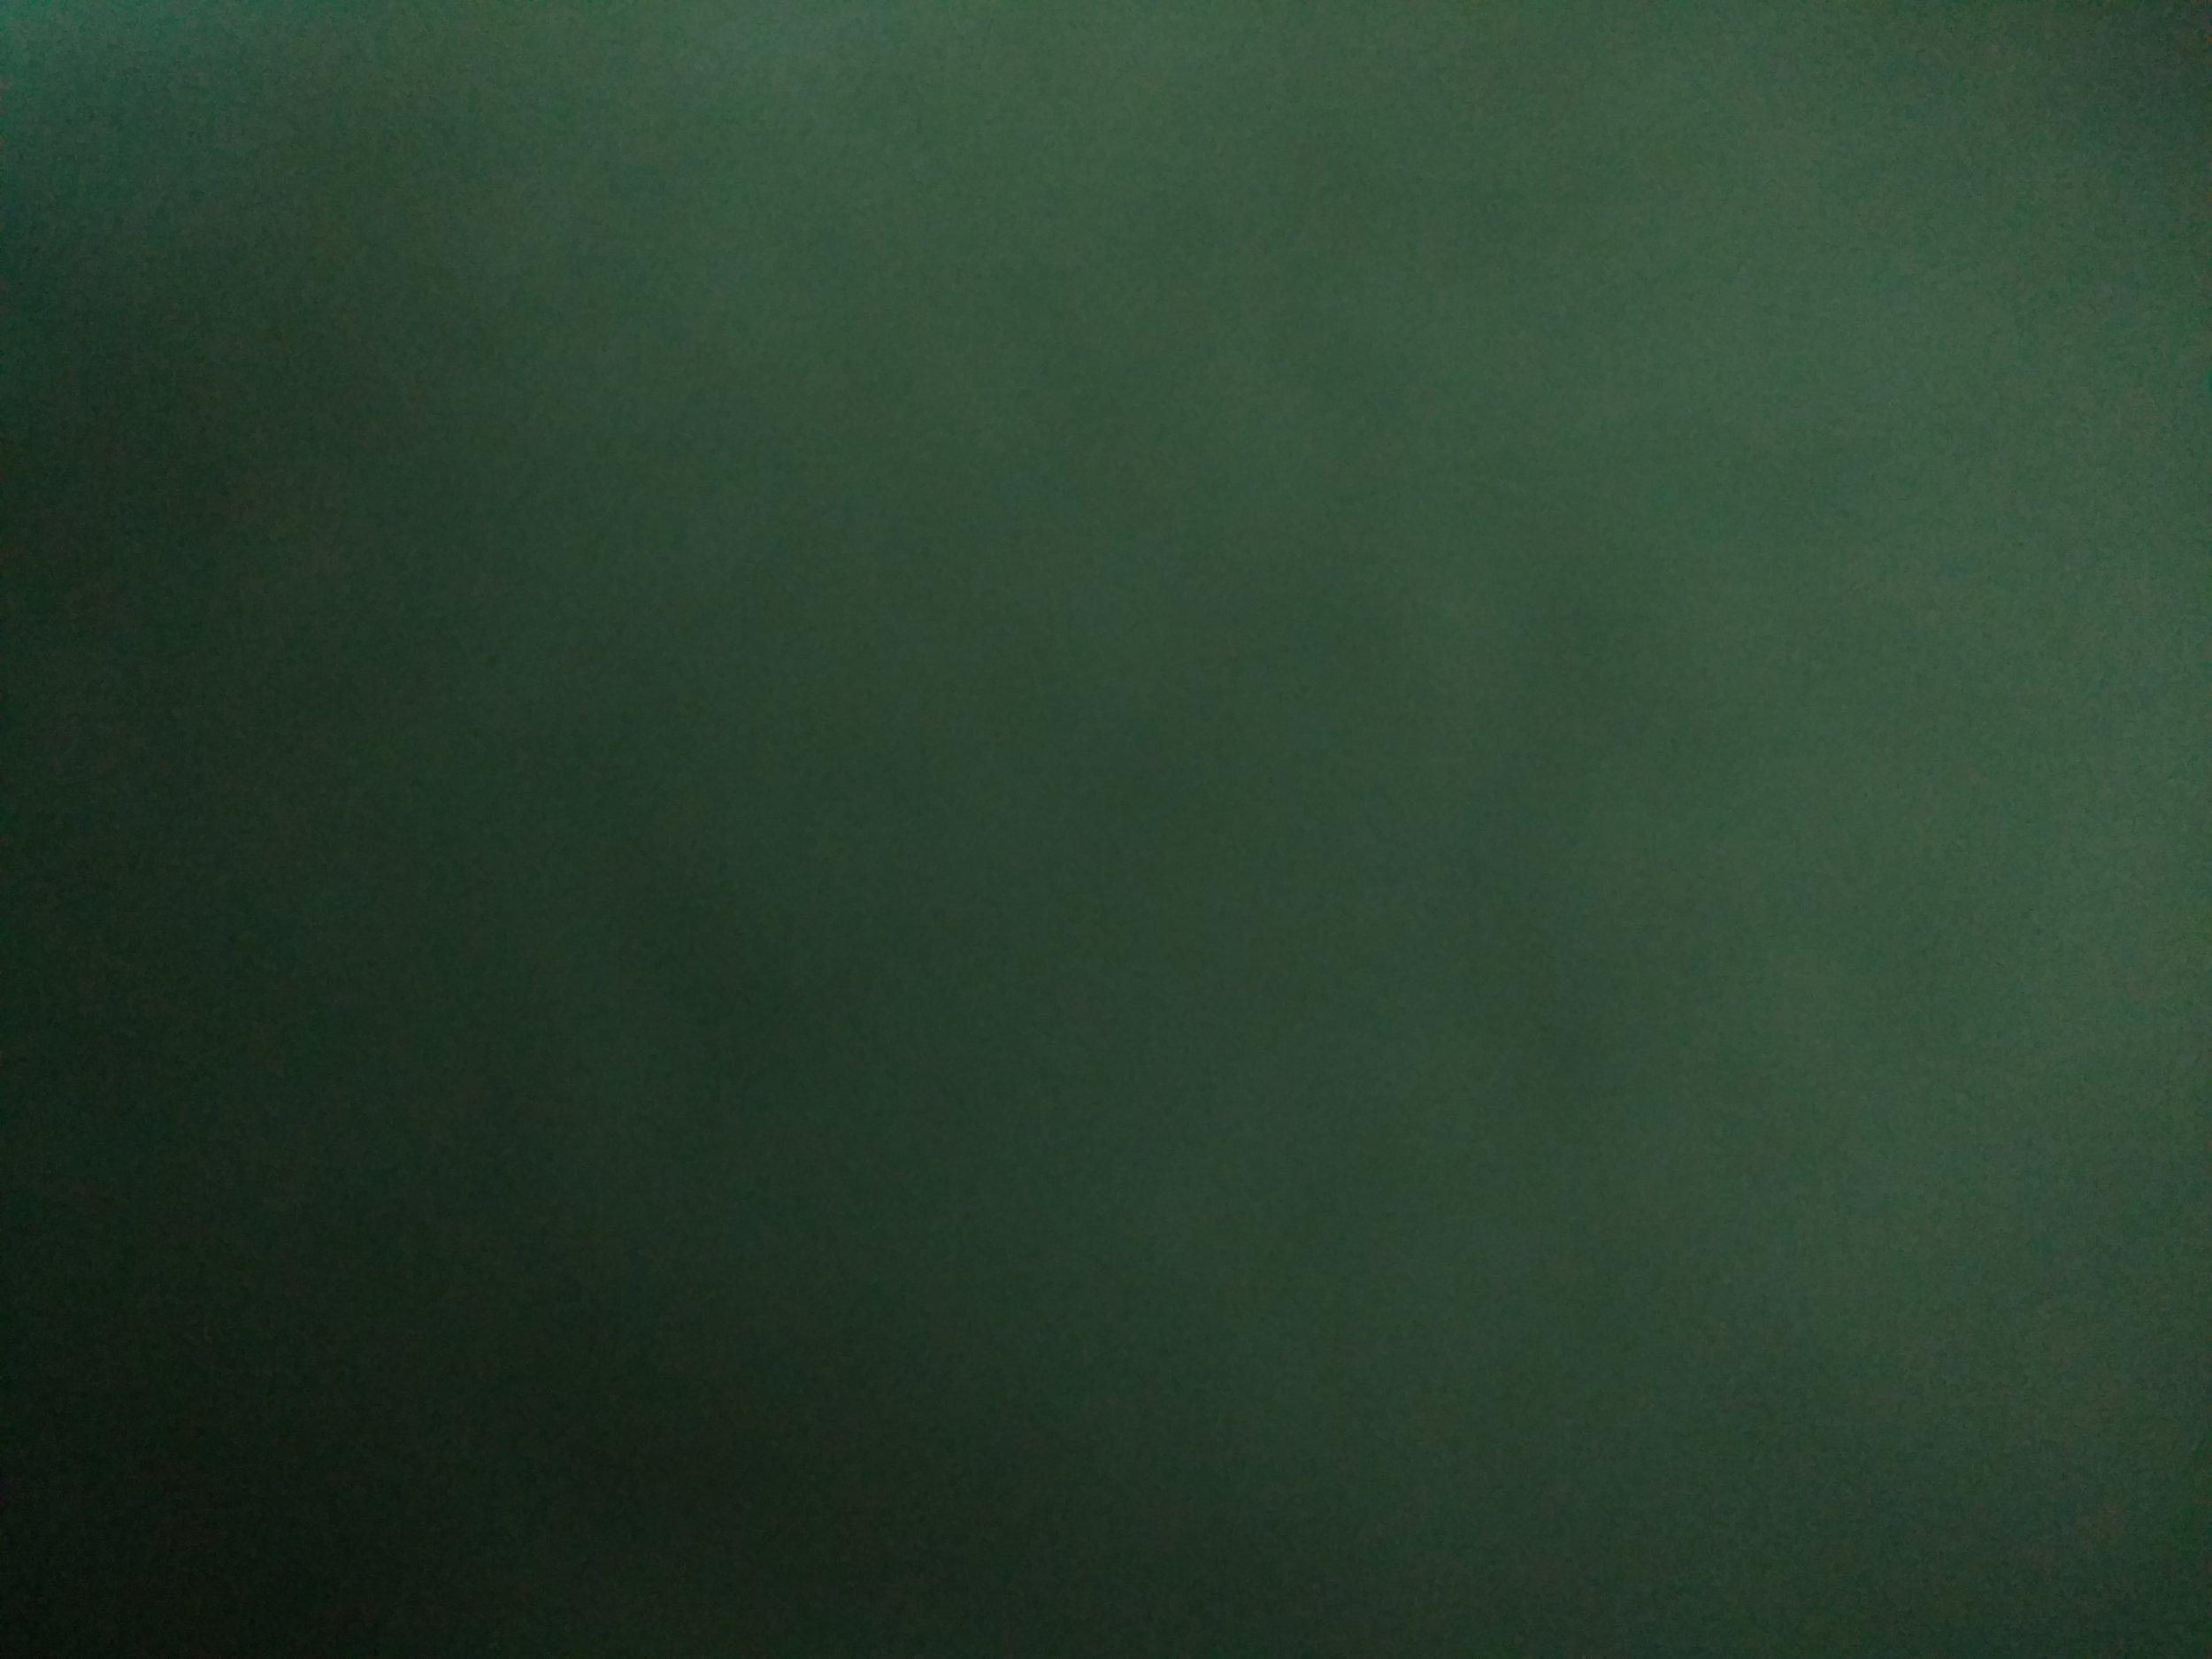 willroth-co-free-texture-gradient-034.jpg